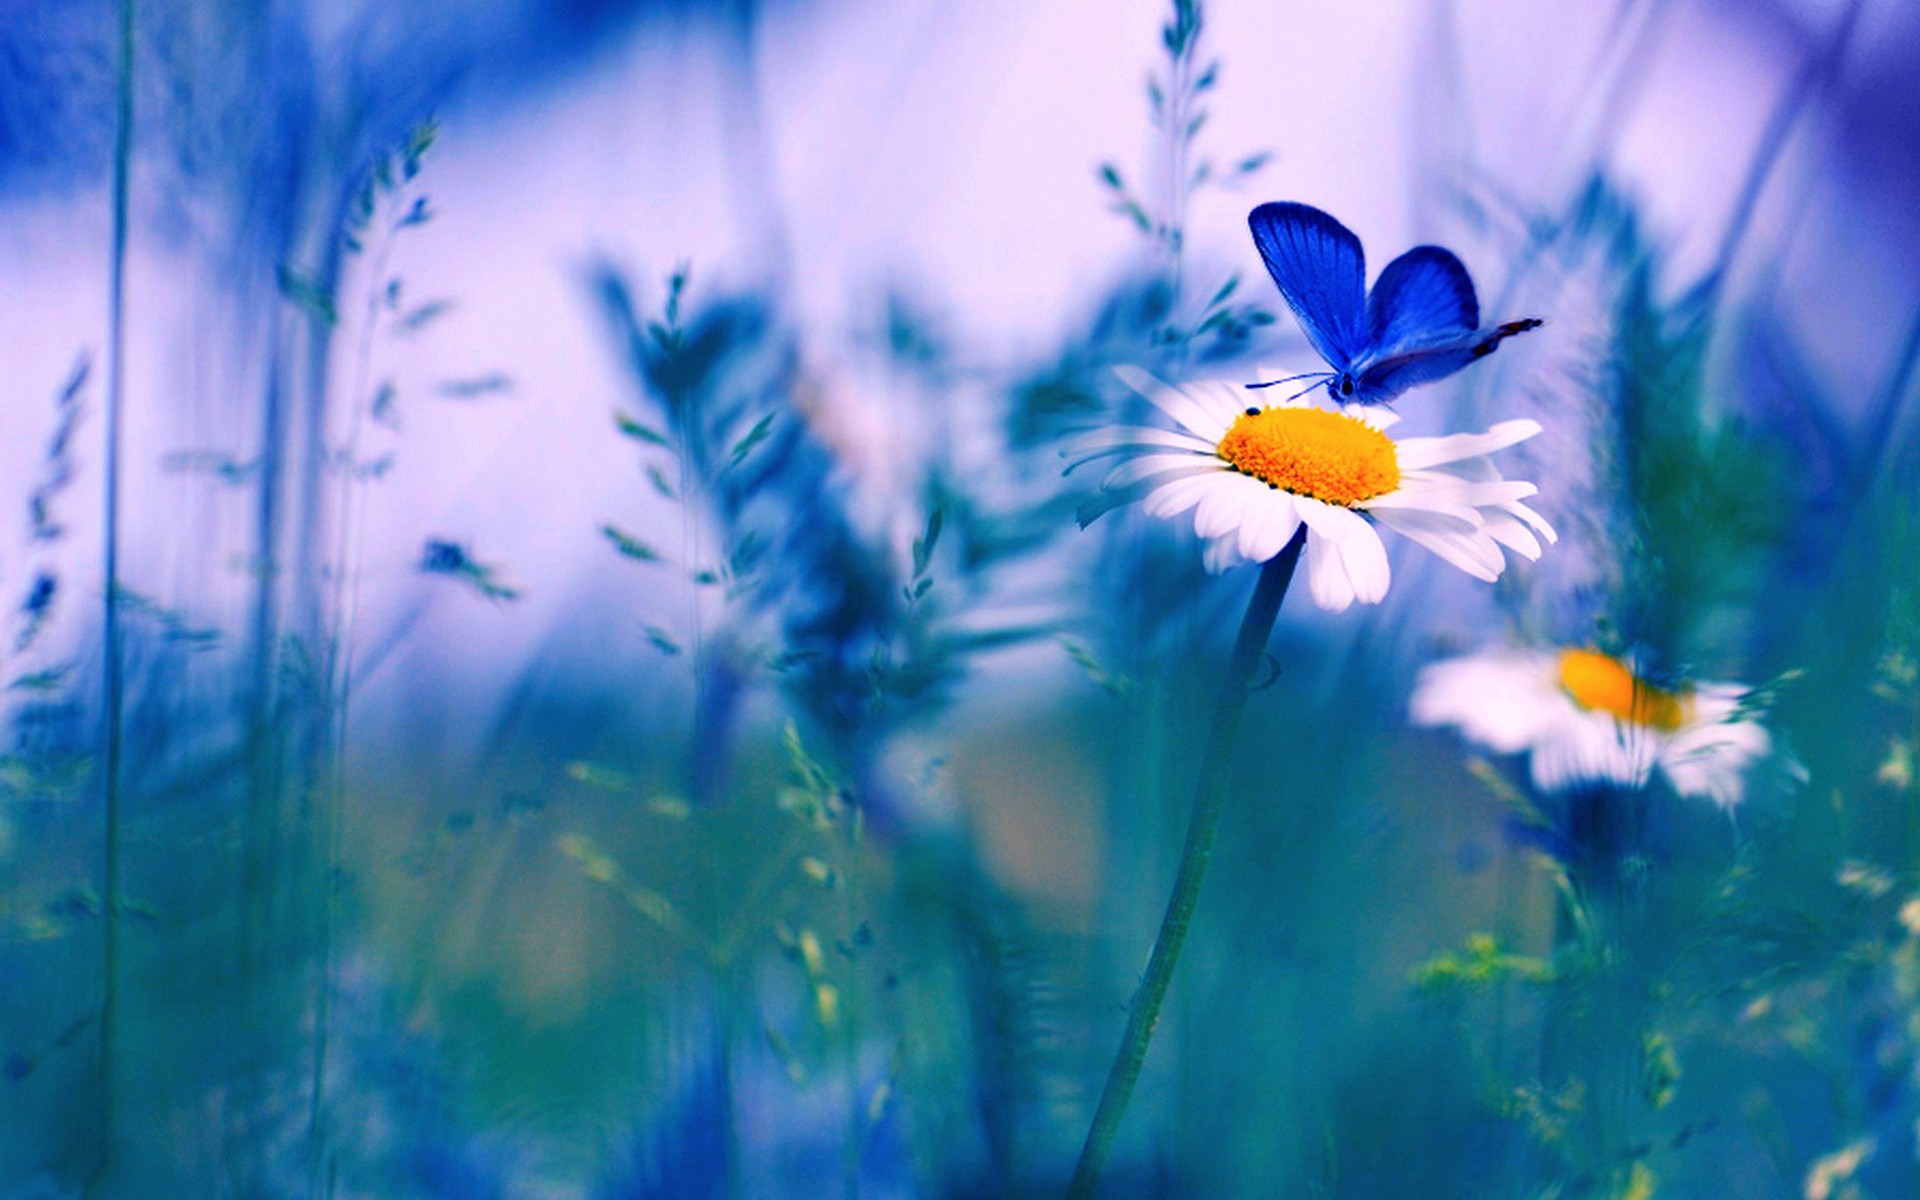 44 spring butterfly wallpaper desktop on wallpapersafari - Wallpapers sites list ...